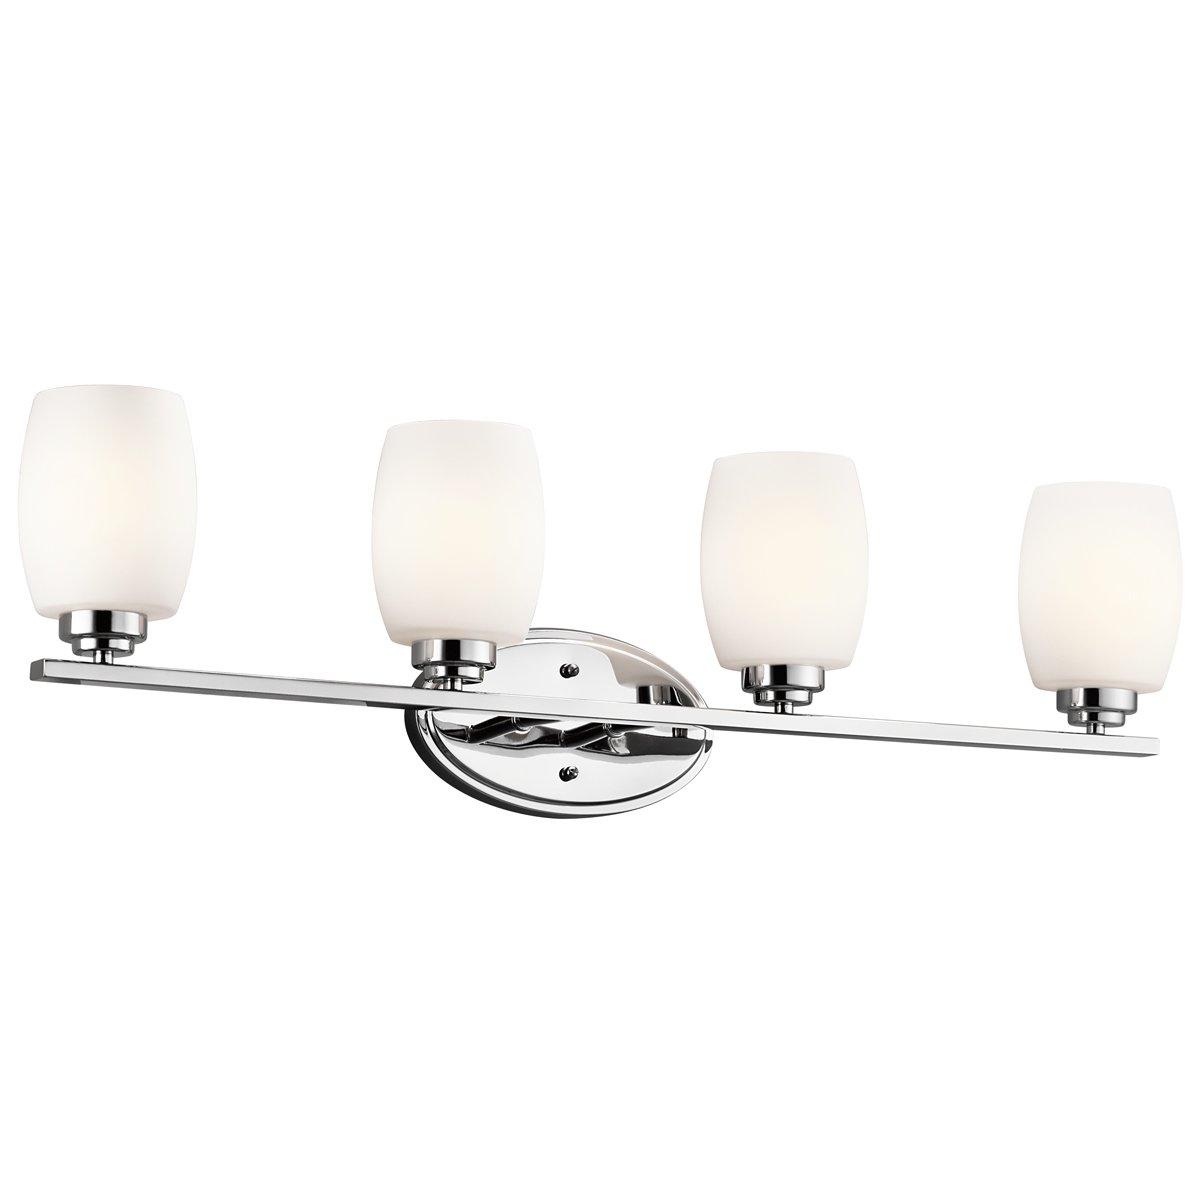 Kichler 5099CH Four Light Bath - Vanity Lighting Fixtures - Amazon.com